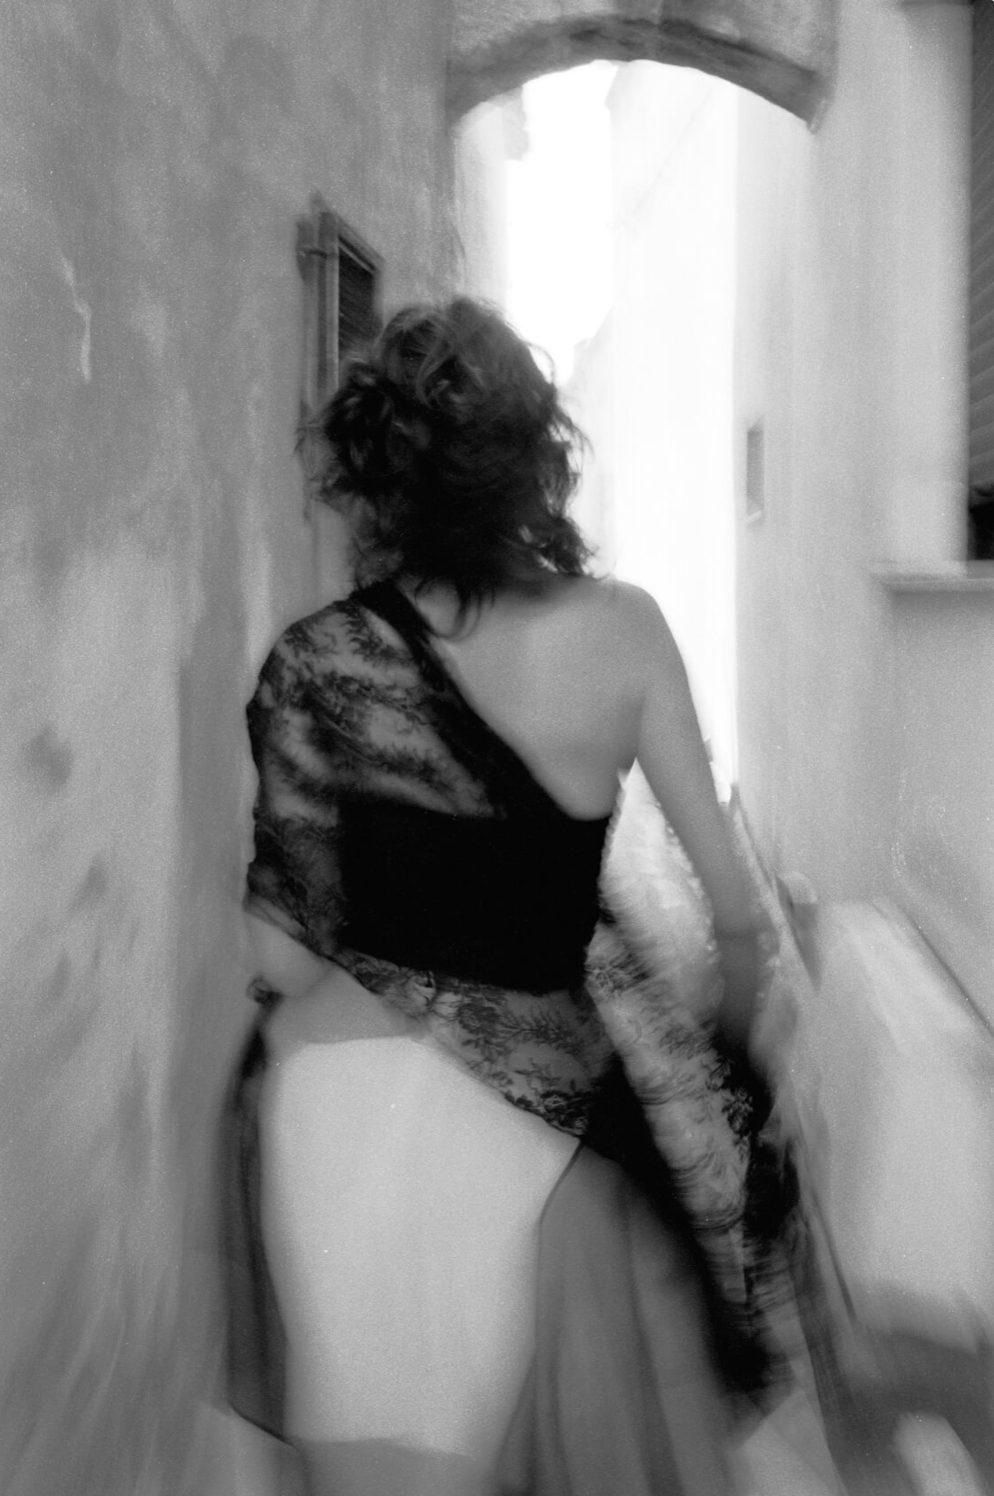 La Dolce Vita, Nº 2, Naples